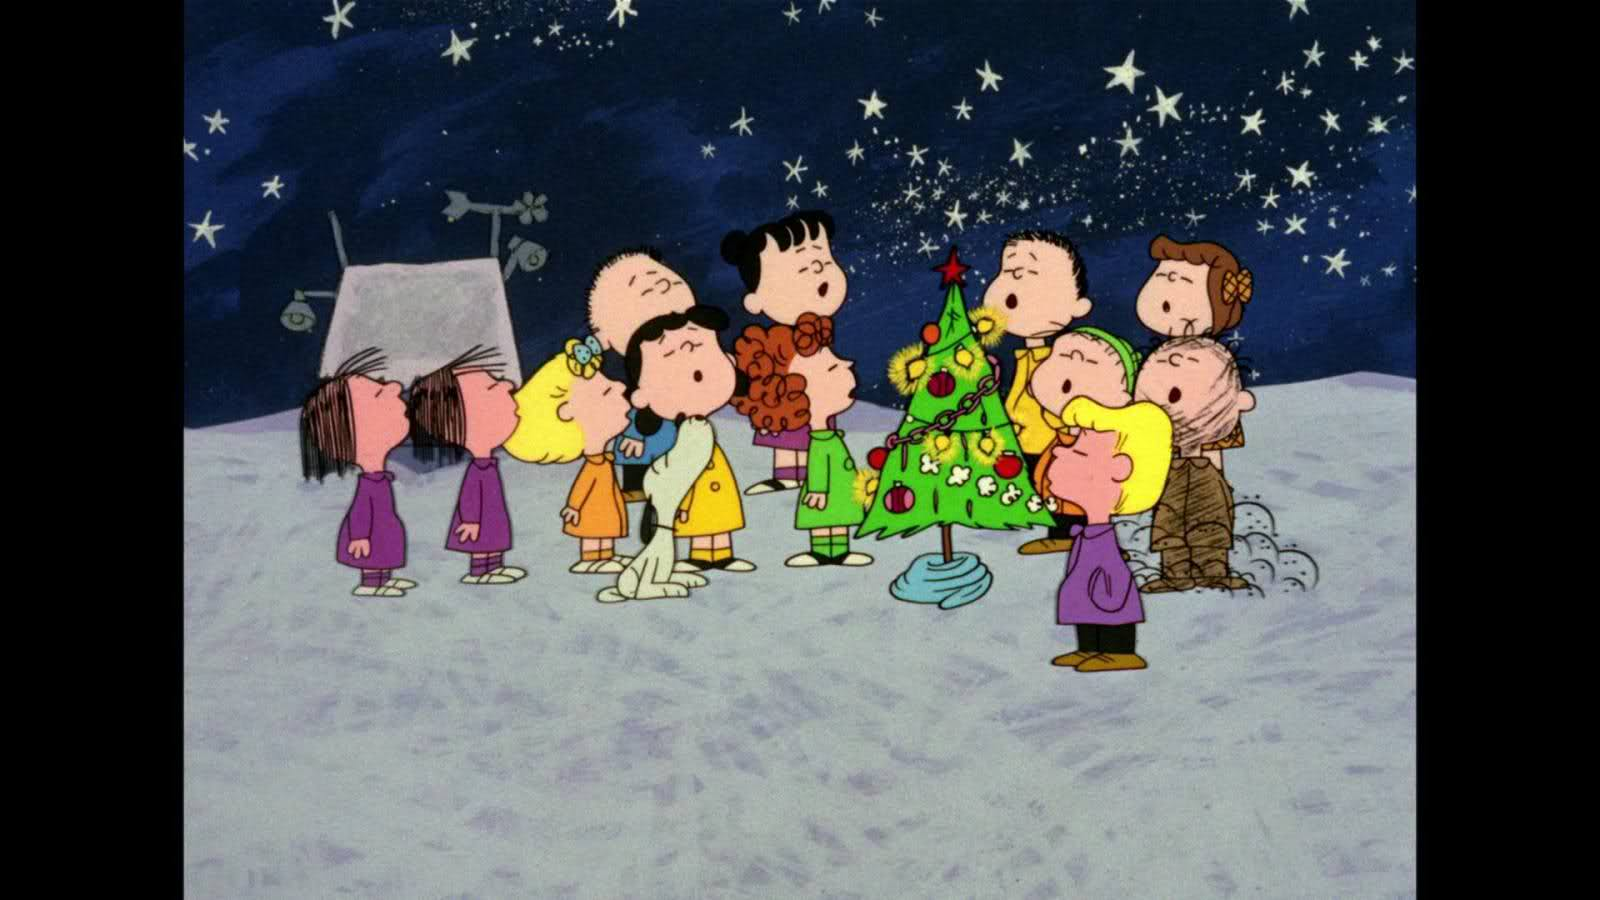 Peanuts Christmas Wallpapers